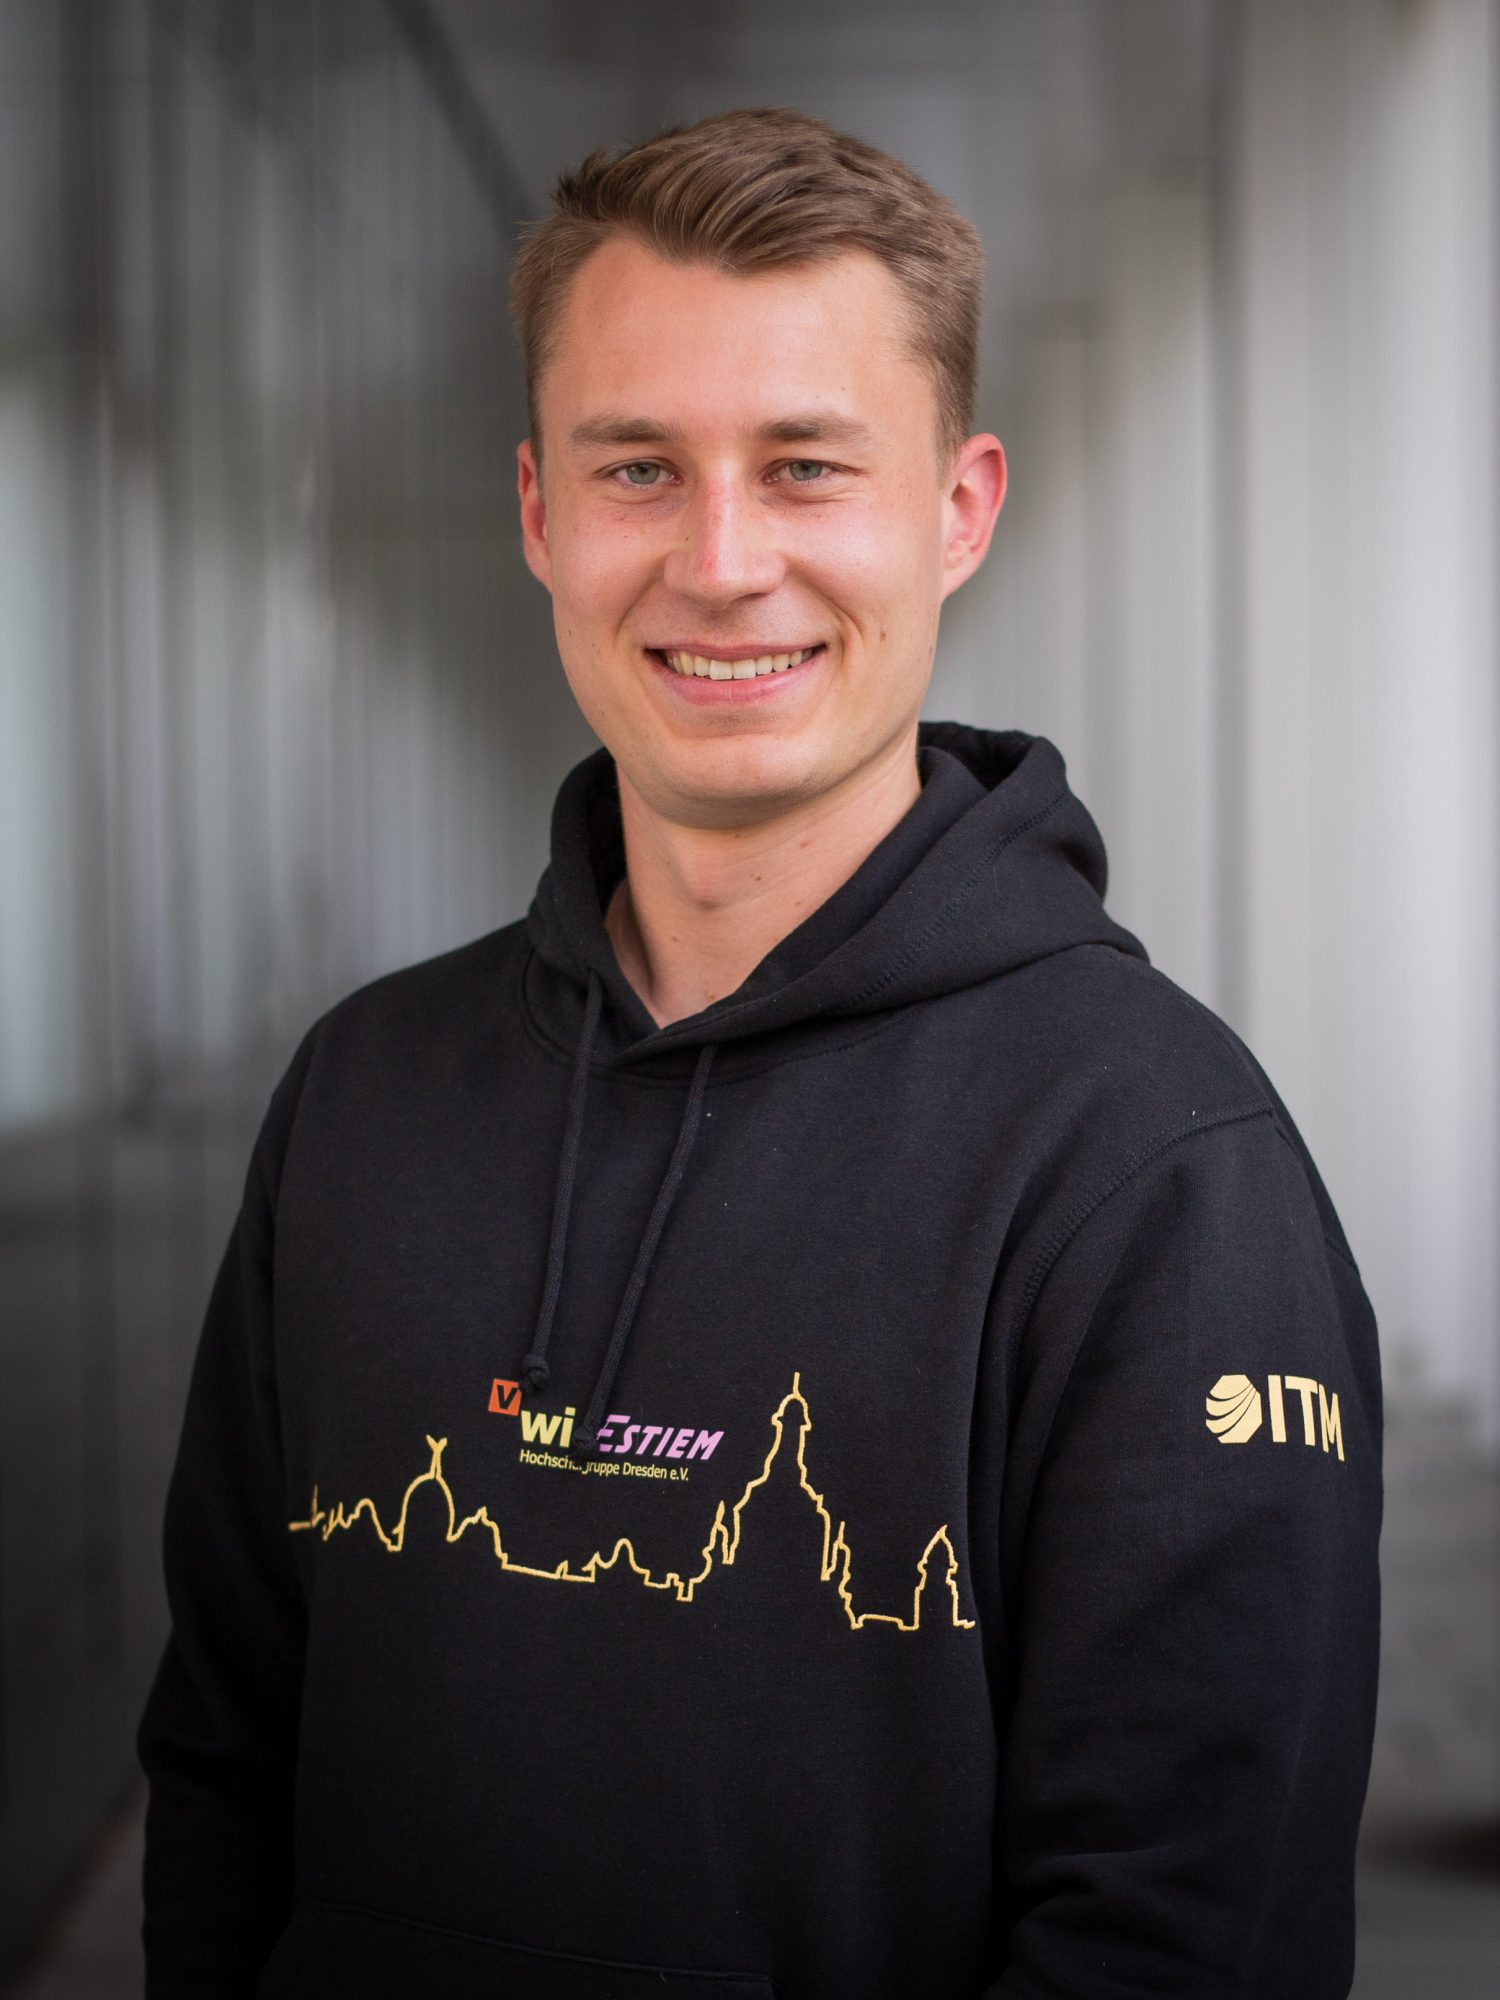 Matthias Pohl